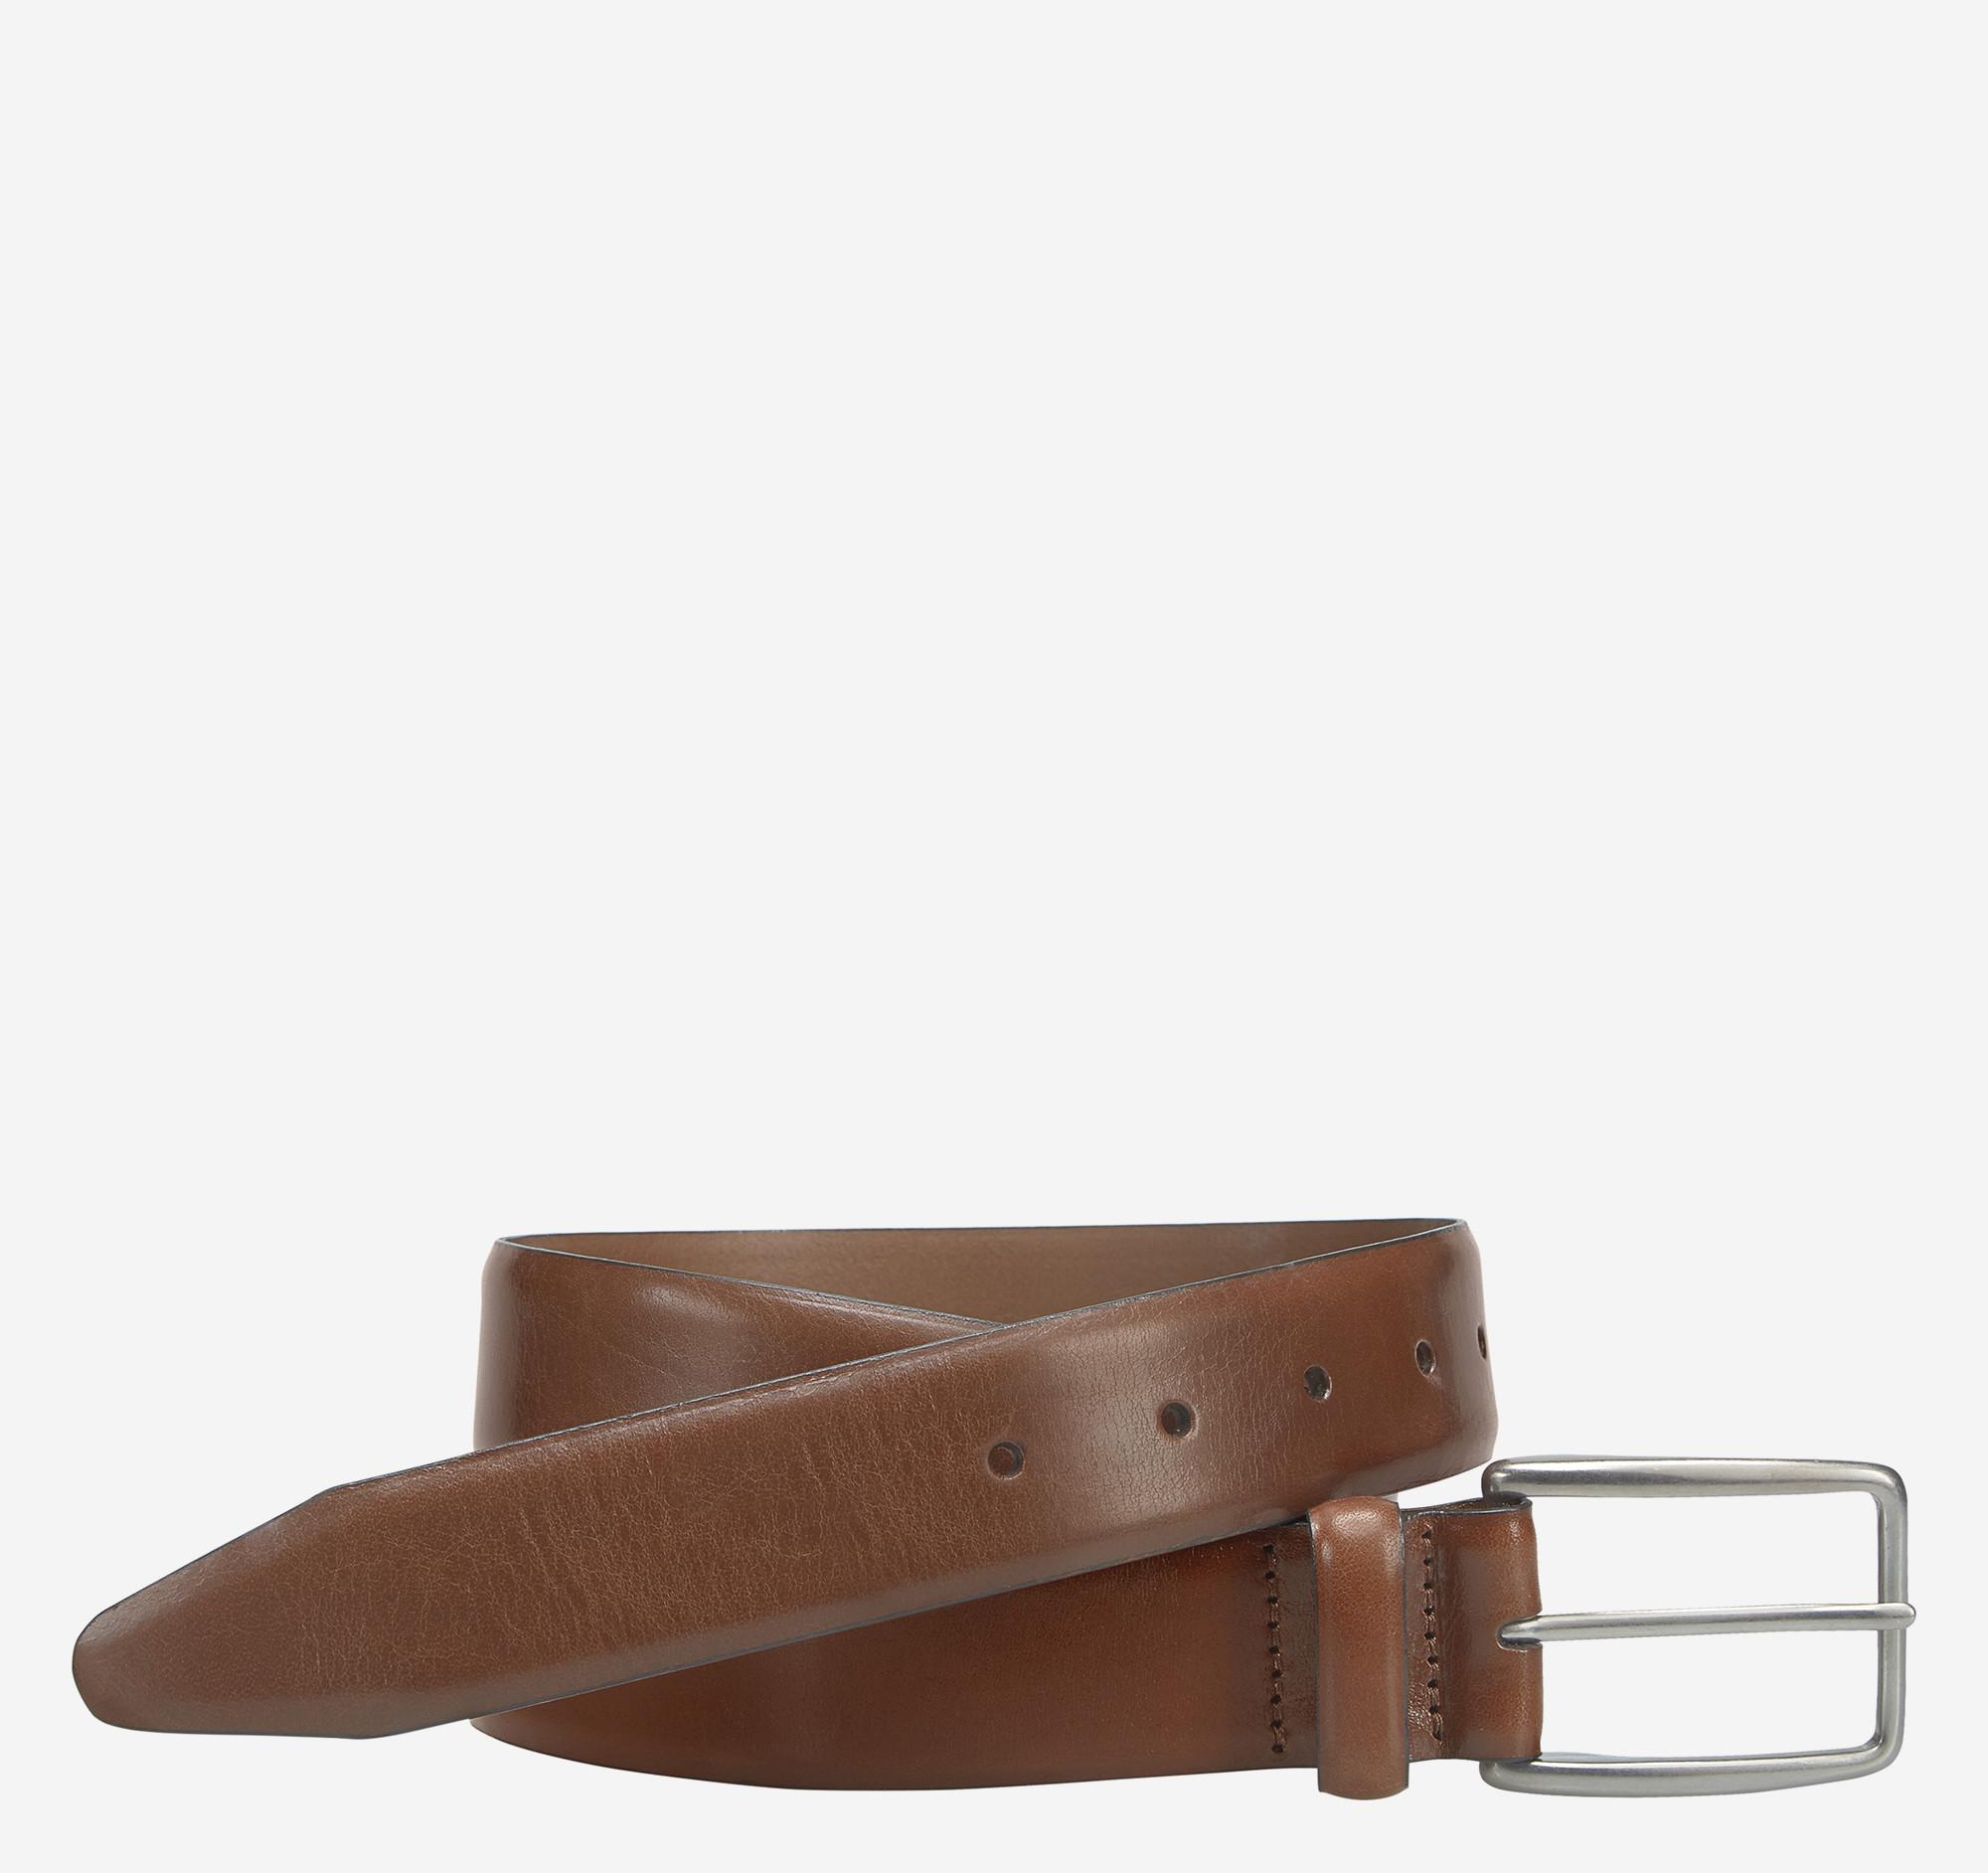 Johnston & Murphy Vintage Dress Belt